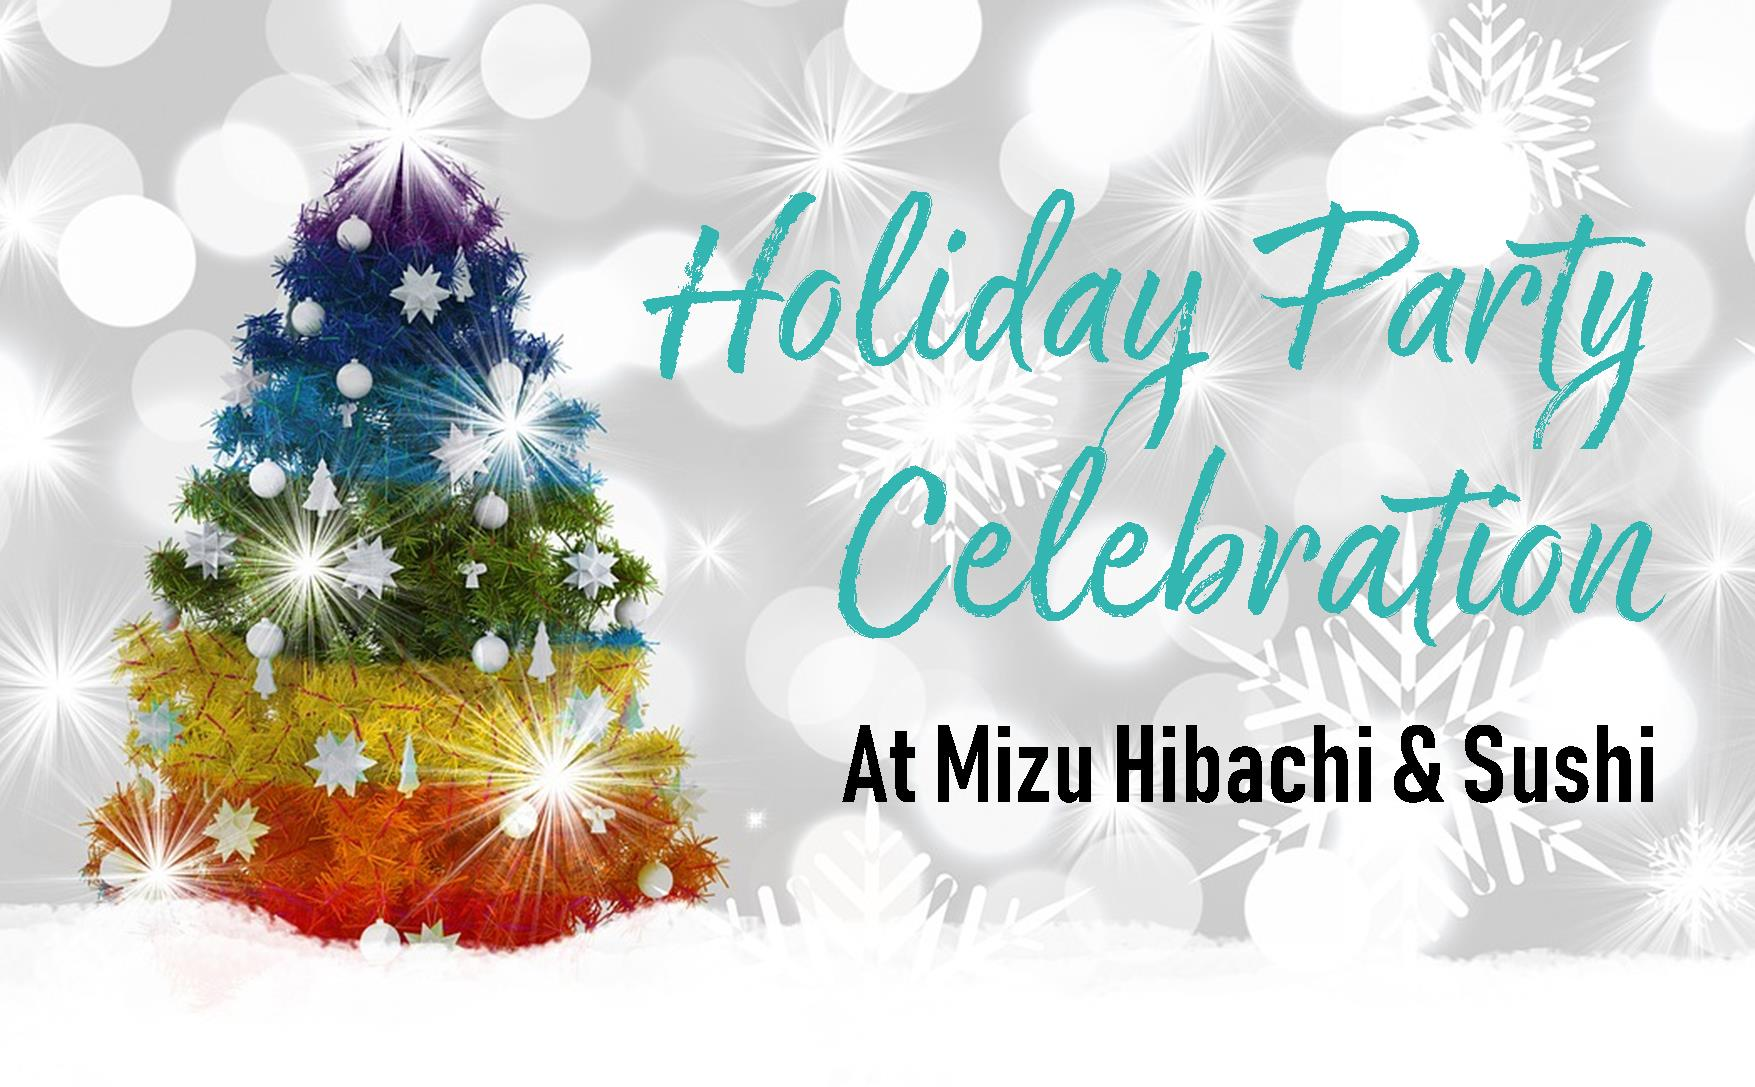 Holiday Party Celebration Dec 21st